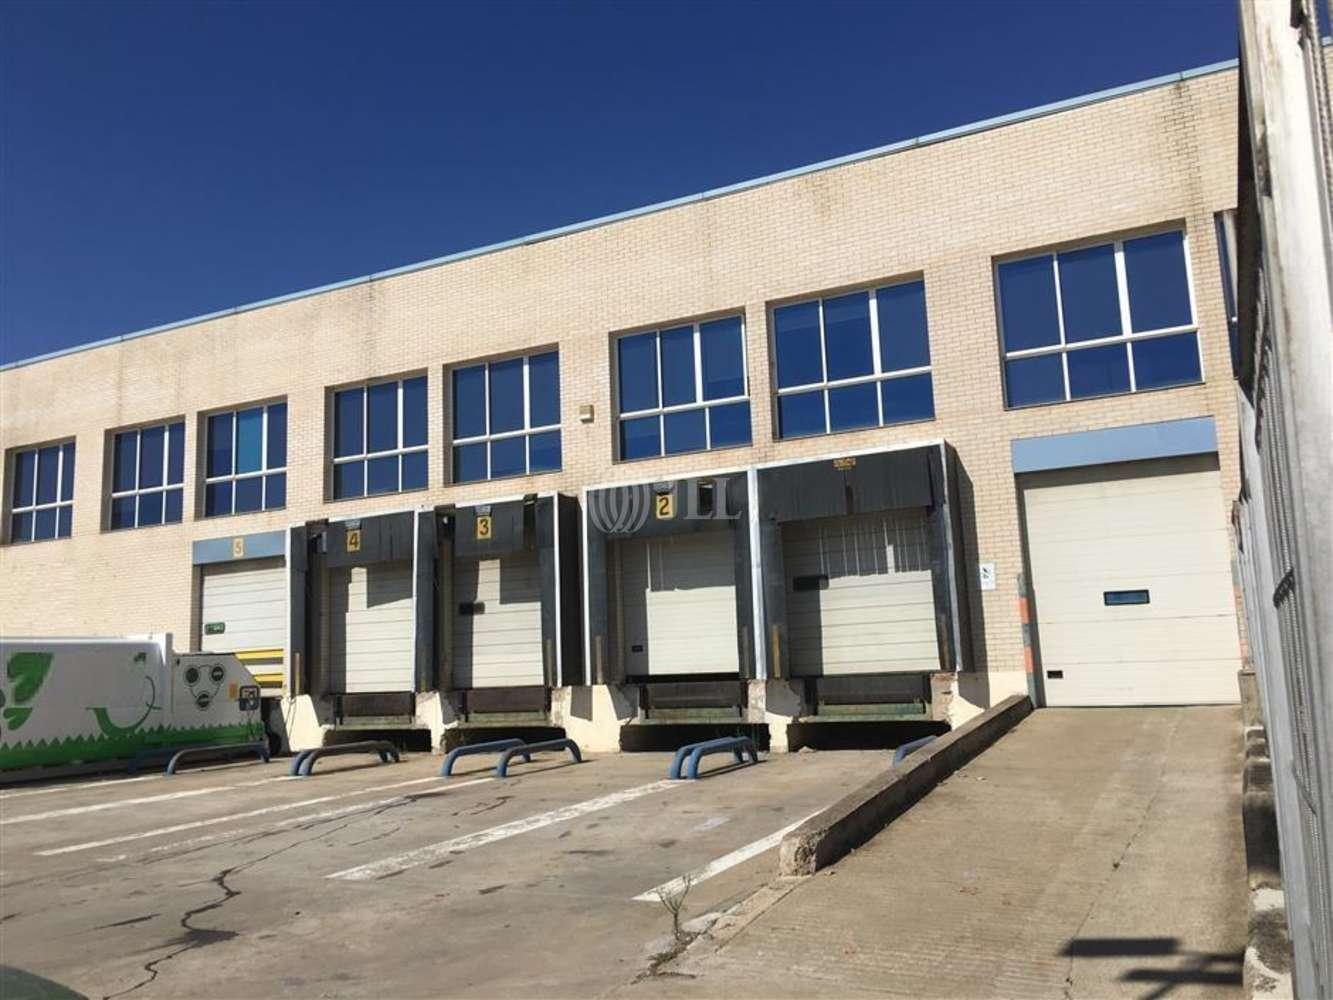 Naves industriales y logísticas Sant fruitós de bages, 08272 - Nave Logistica - B0425 - PI SANT ISIDRE - 8726